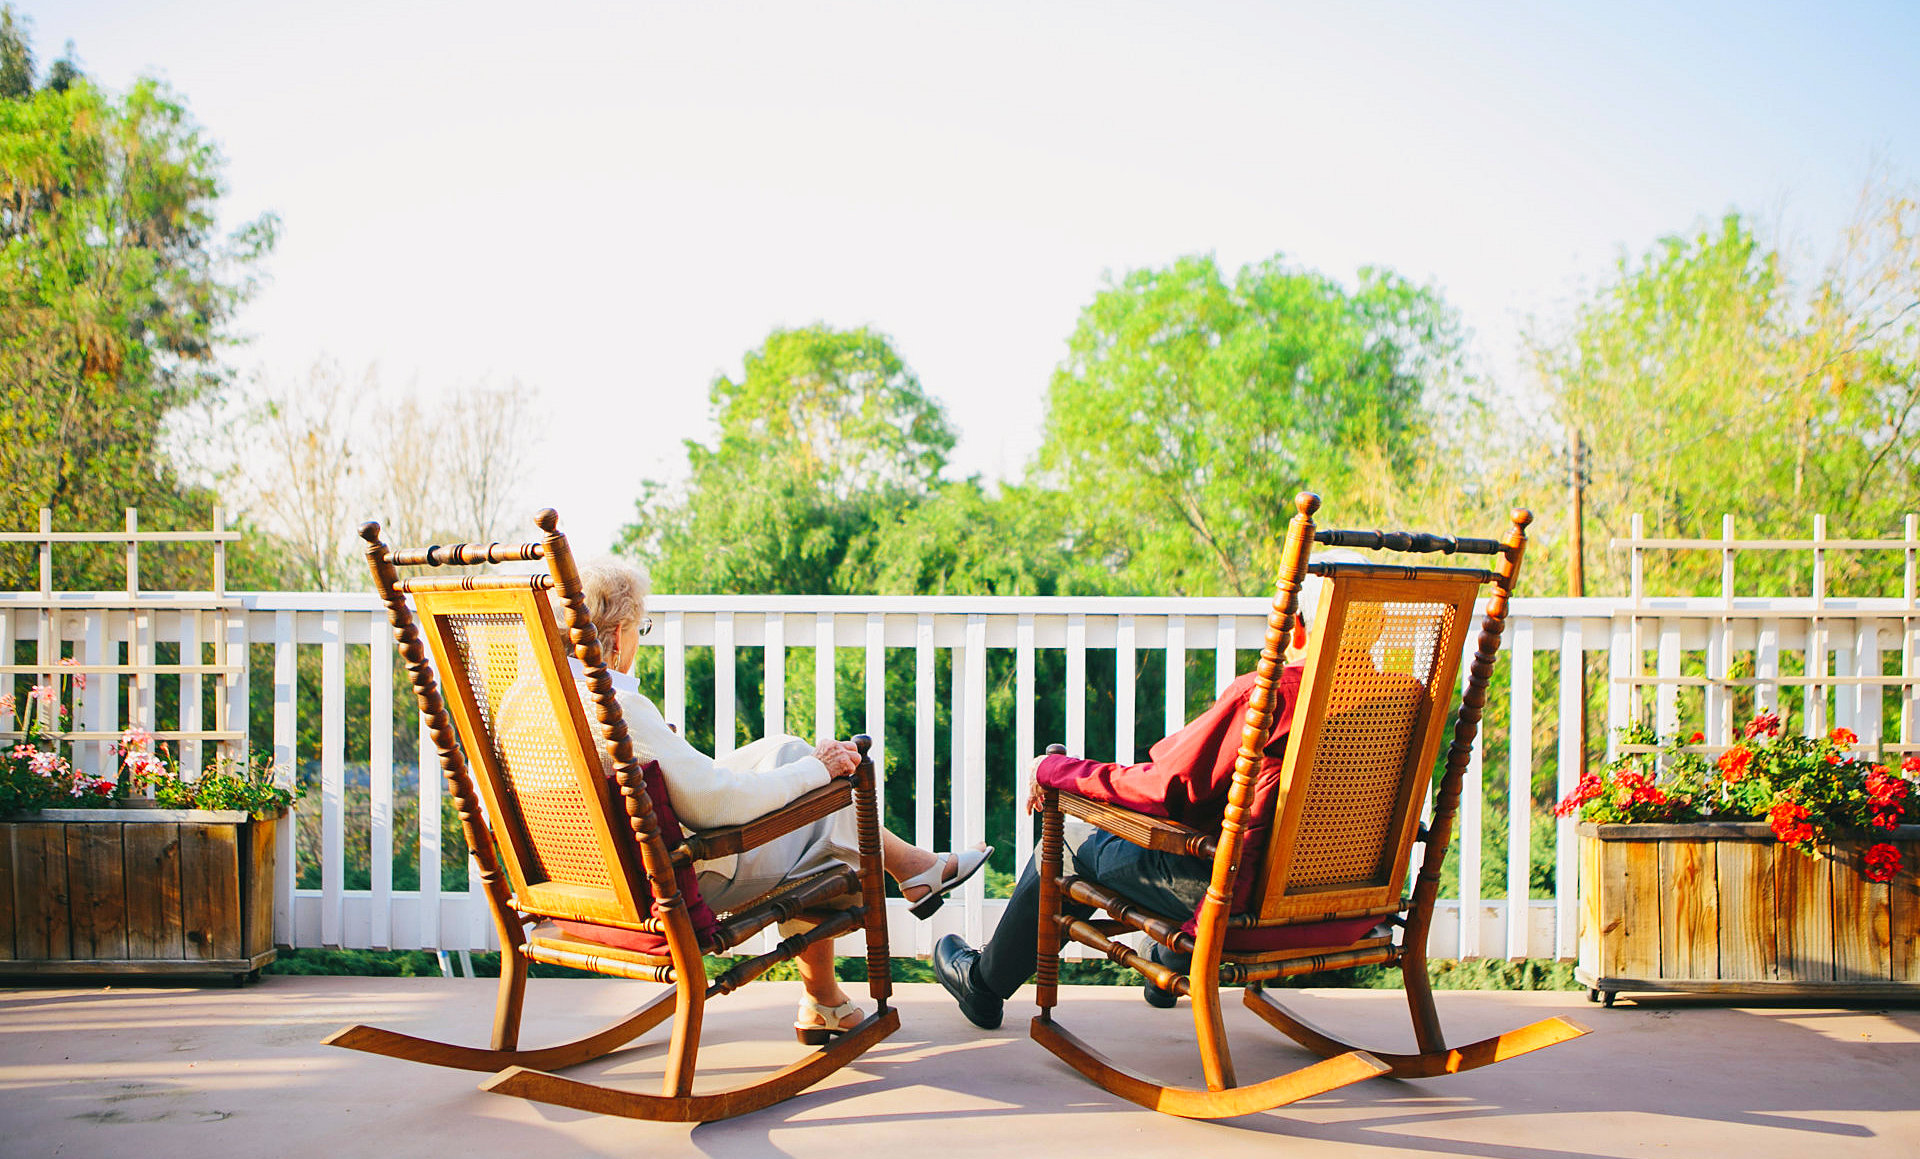 senior couple sitting on the rocking chair